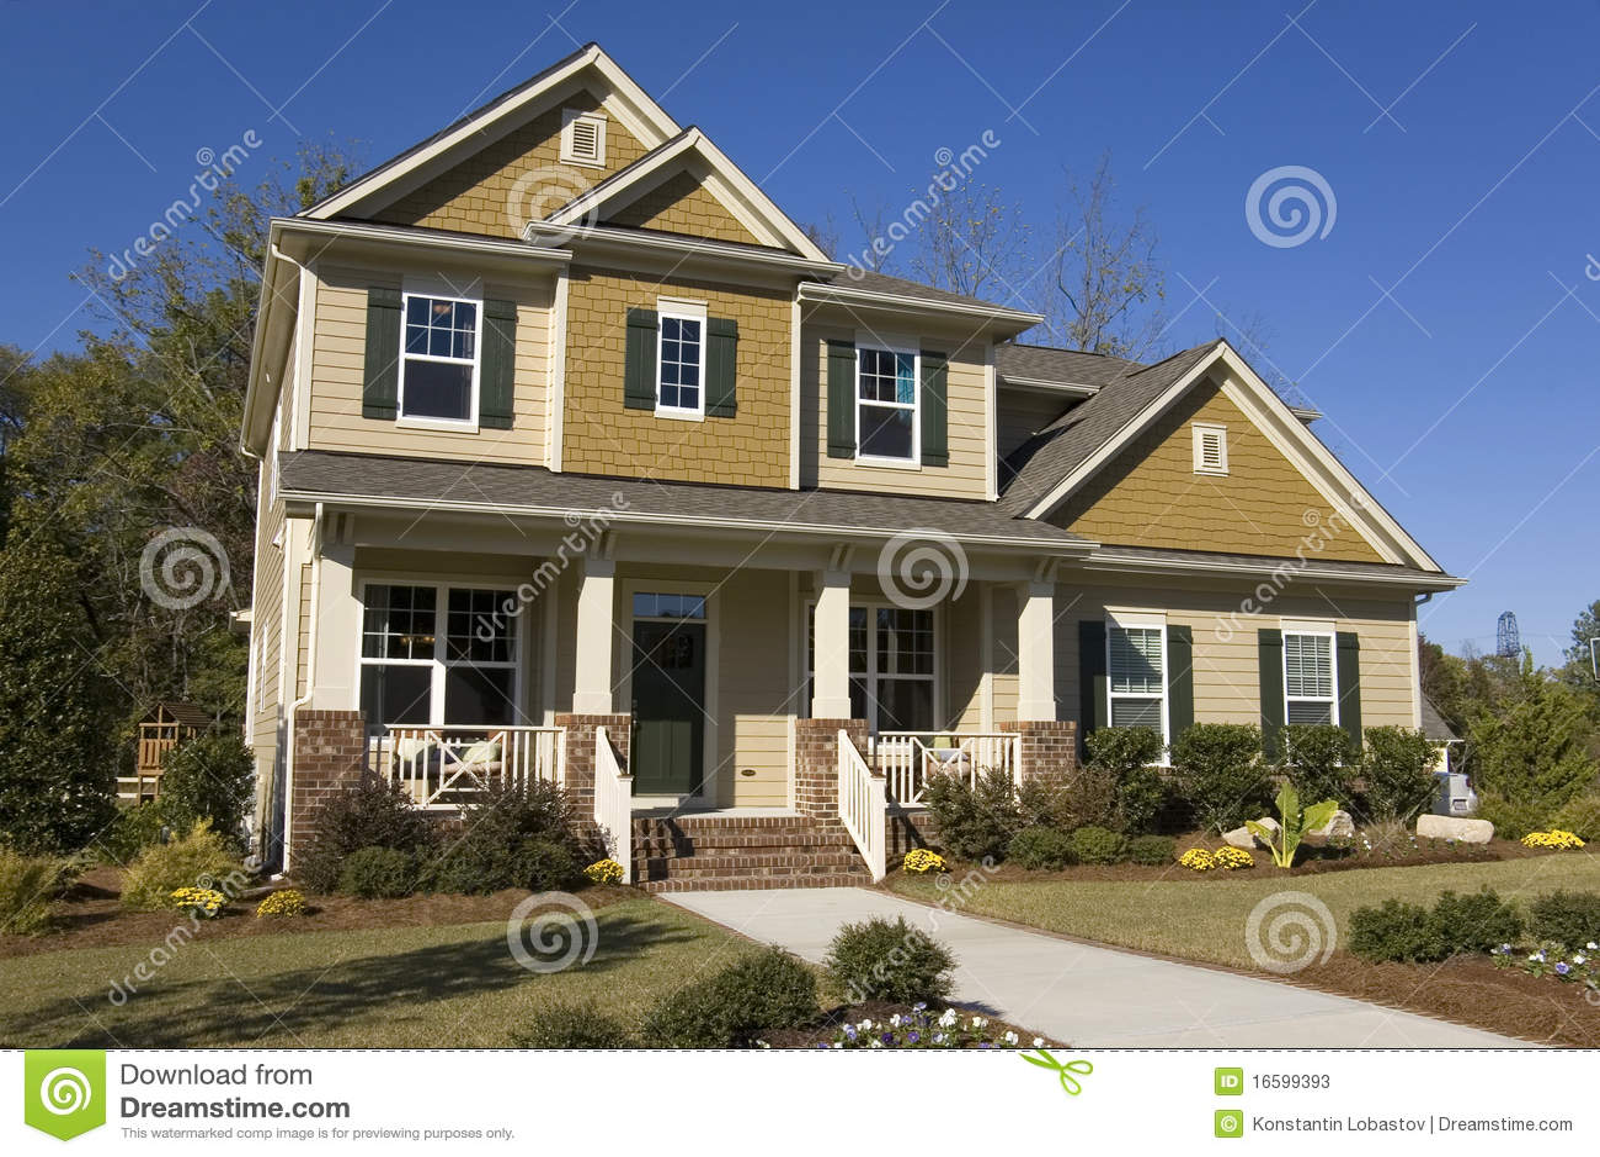 new suburban house for sale stock photos image 16599393